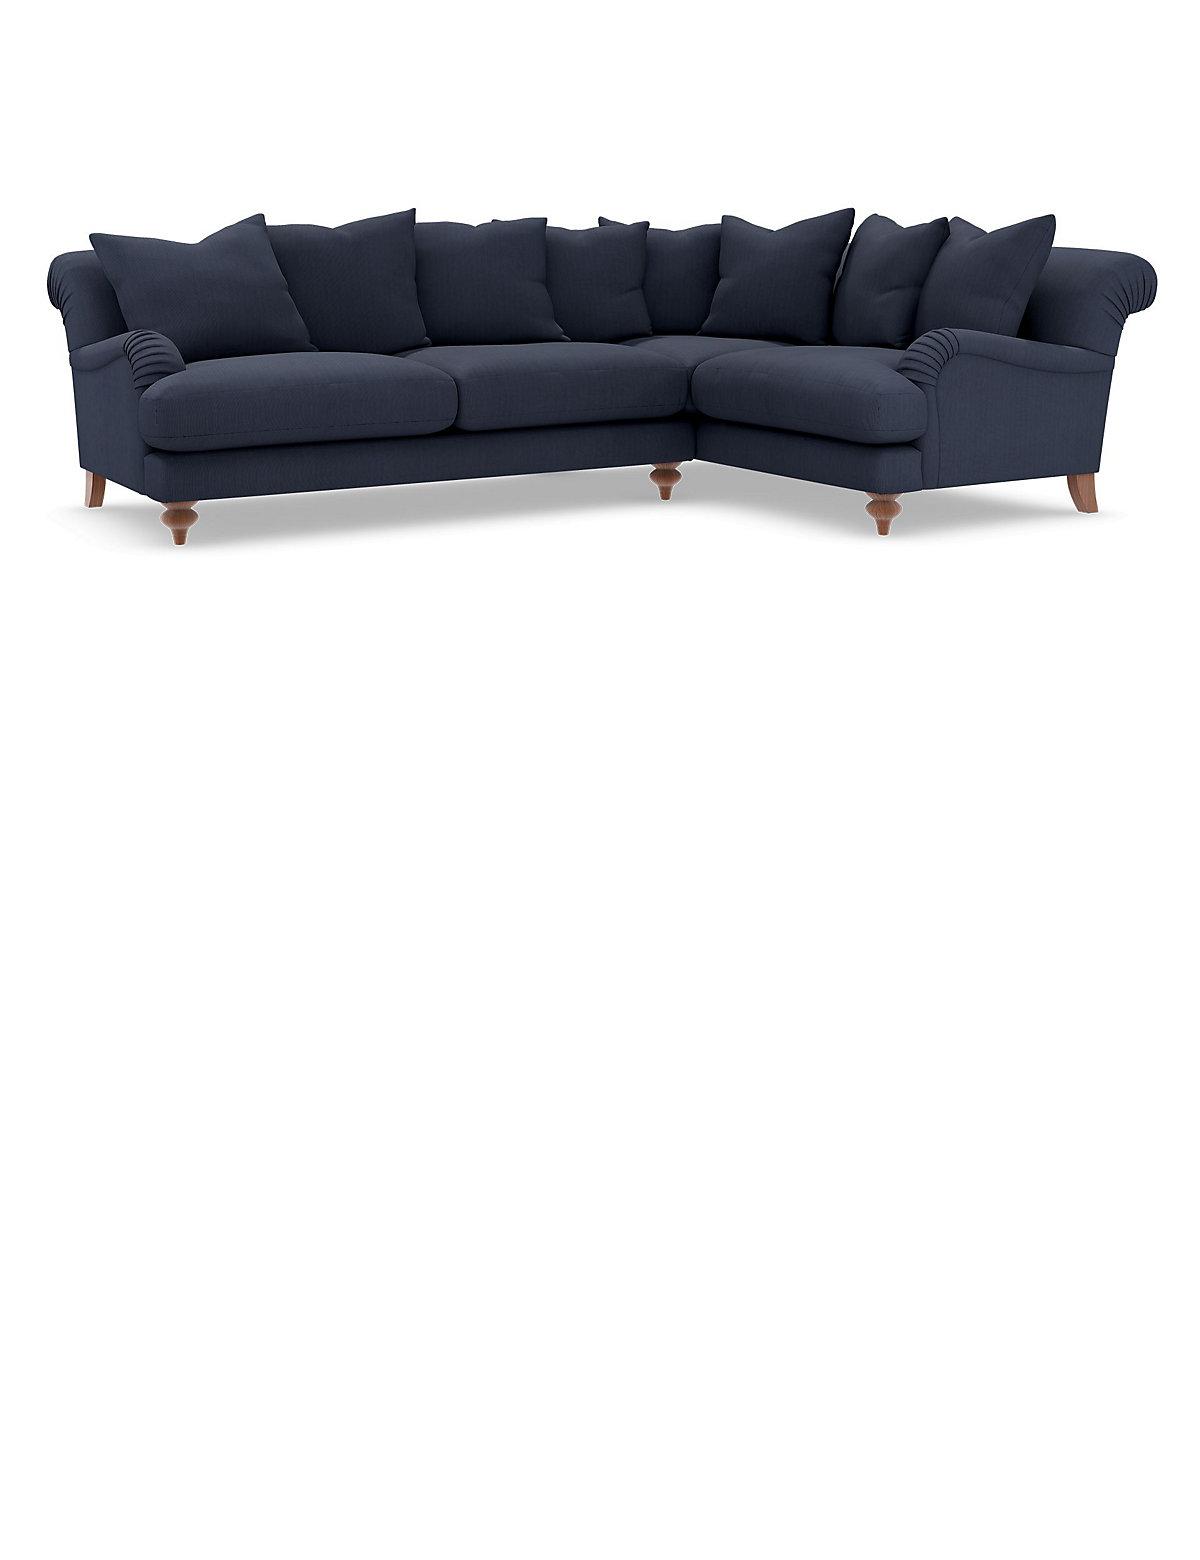 Stupendous Marks And Spencer Furniture Sofas Corner Creativecarmelina Interior Chair Design Creativecarmelinacom